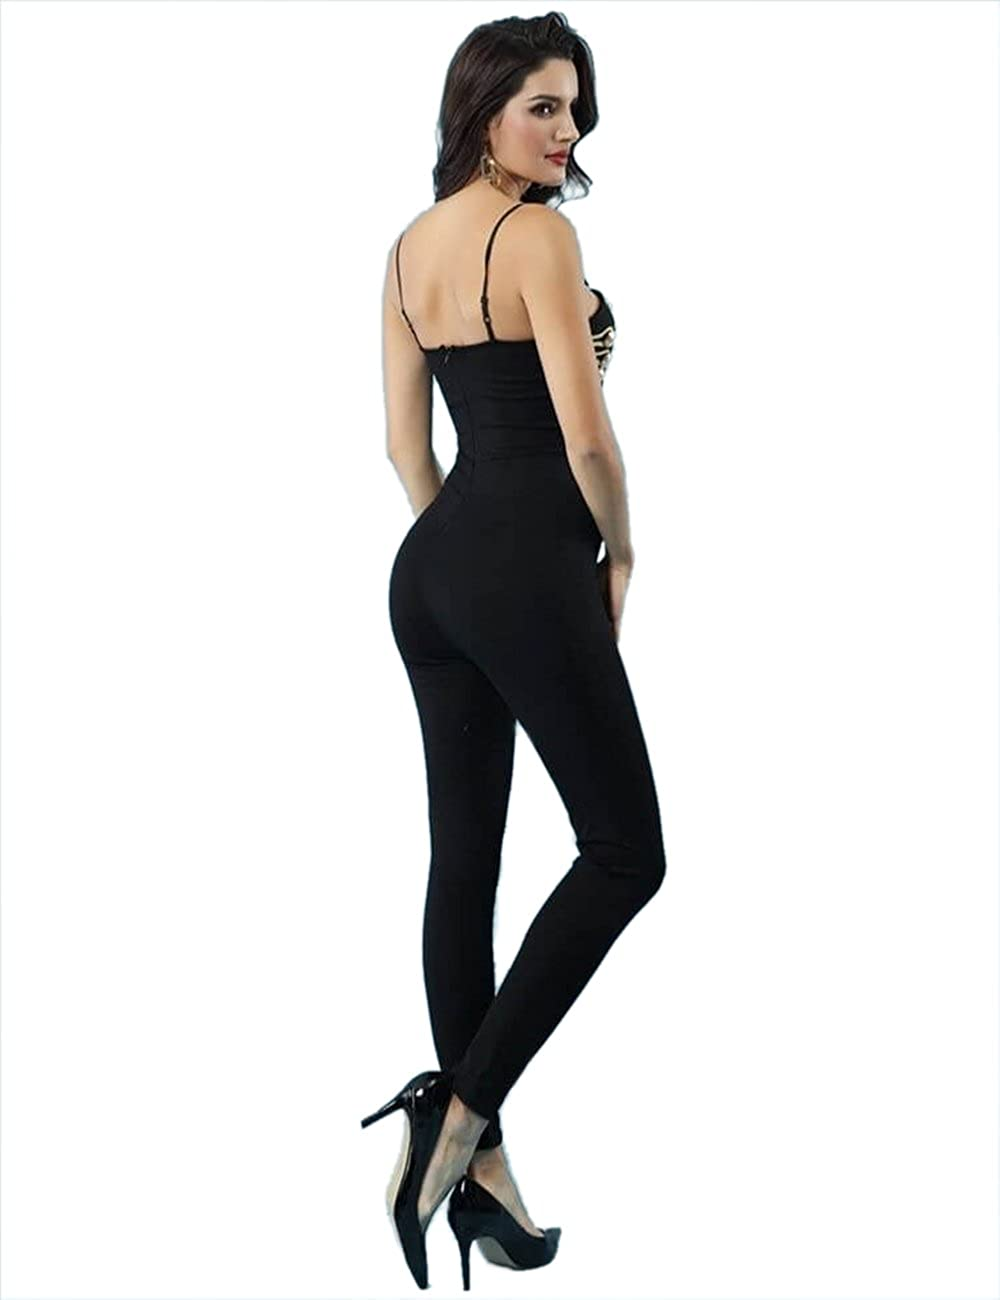 e8e20a2184b Amazon.com  VINKKE Women s Bandage Jumpsuit Clubwear Bodycon Spaghetti  Strap Romper Pants  Clothing